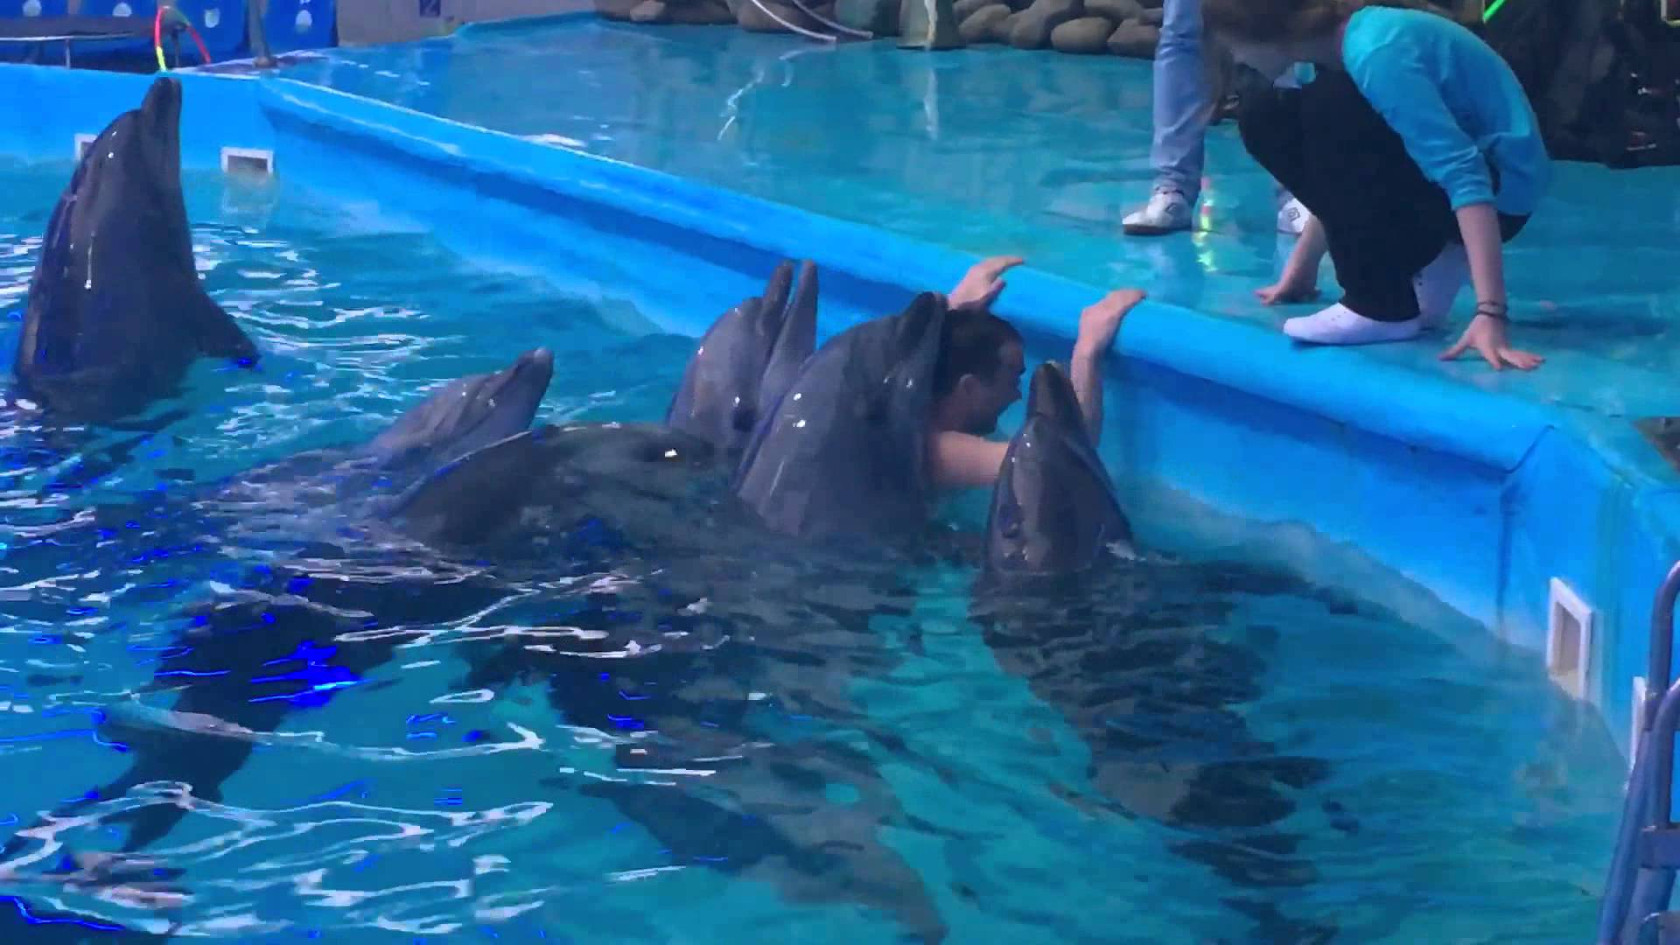 Нападение дельфина на человека